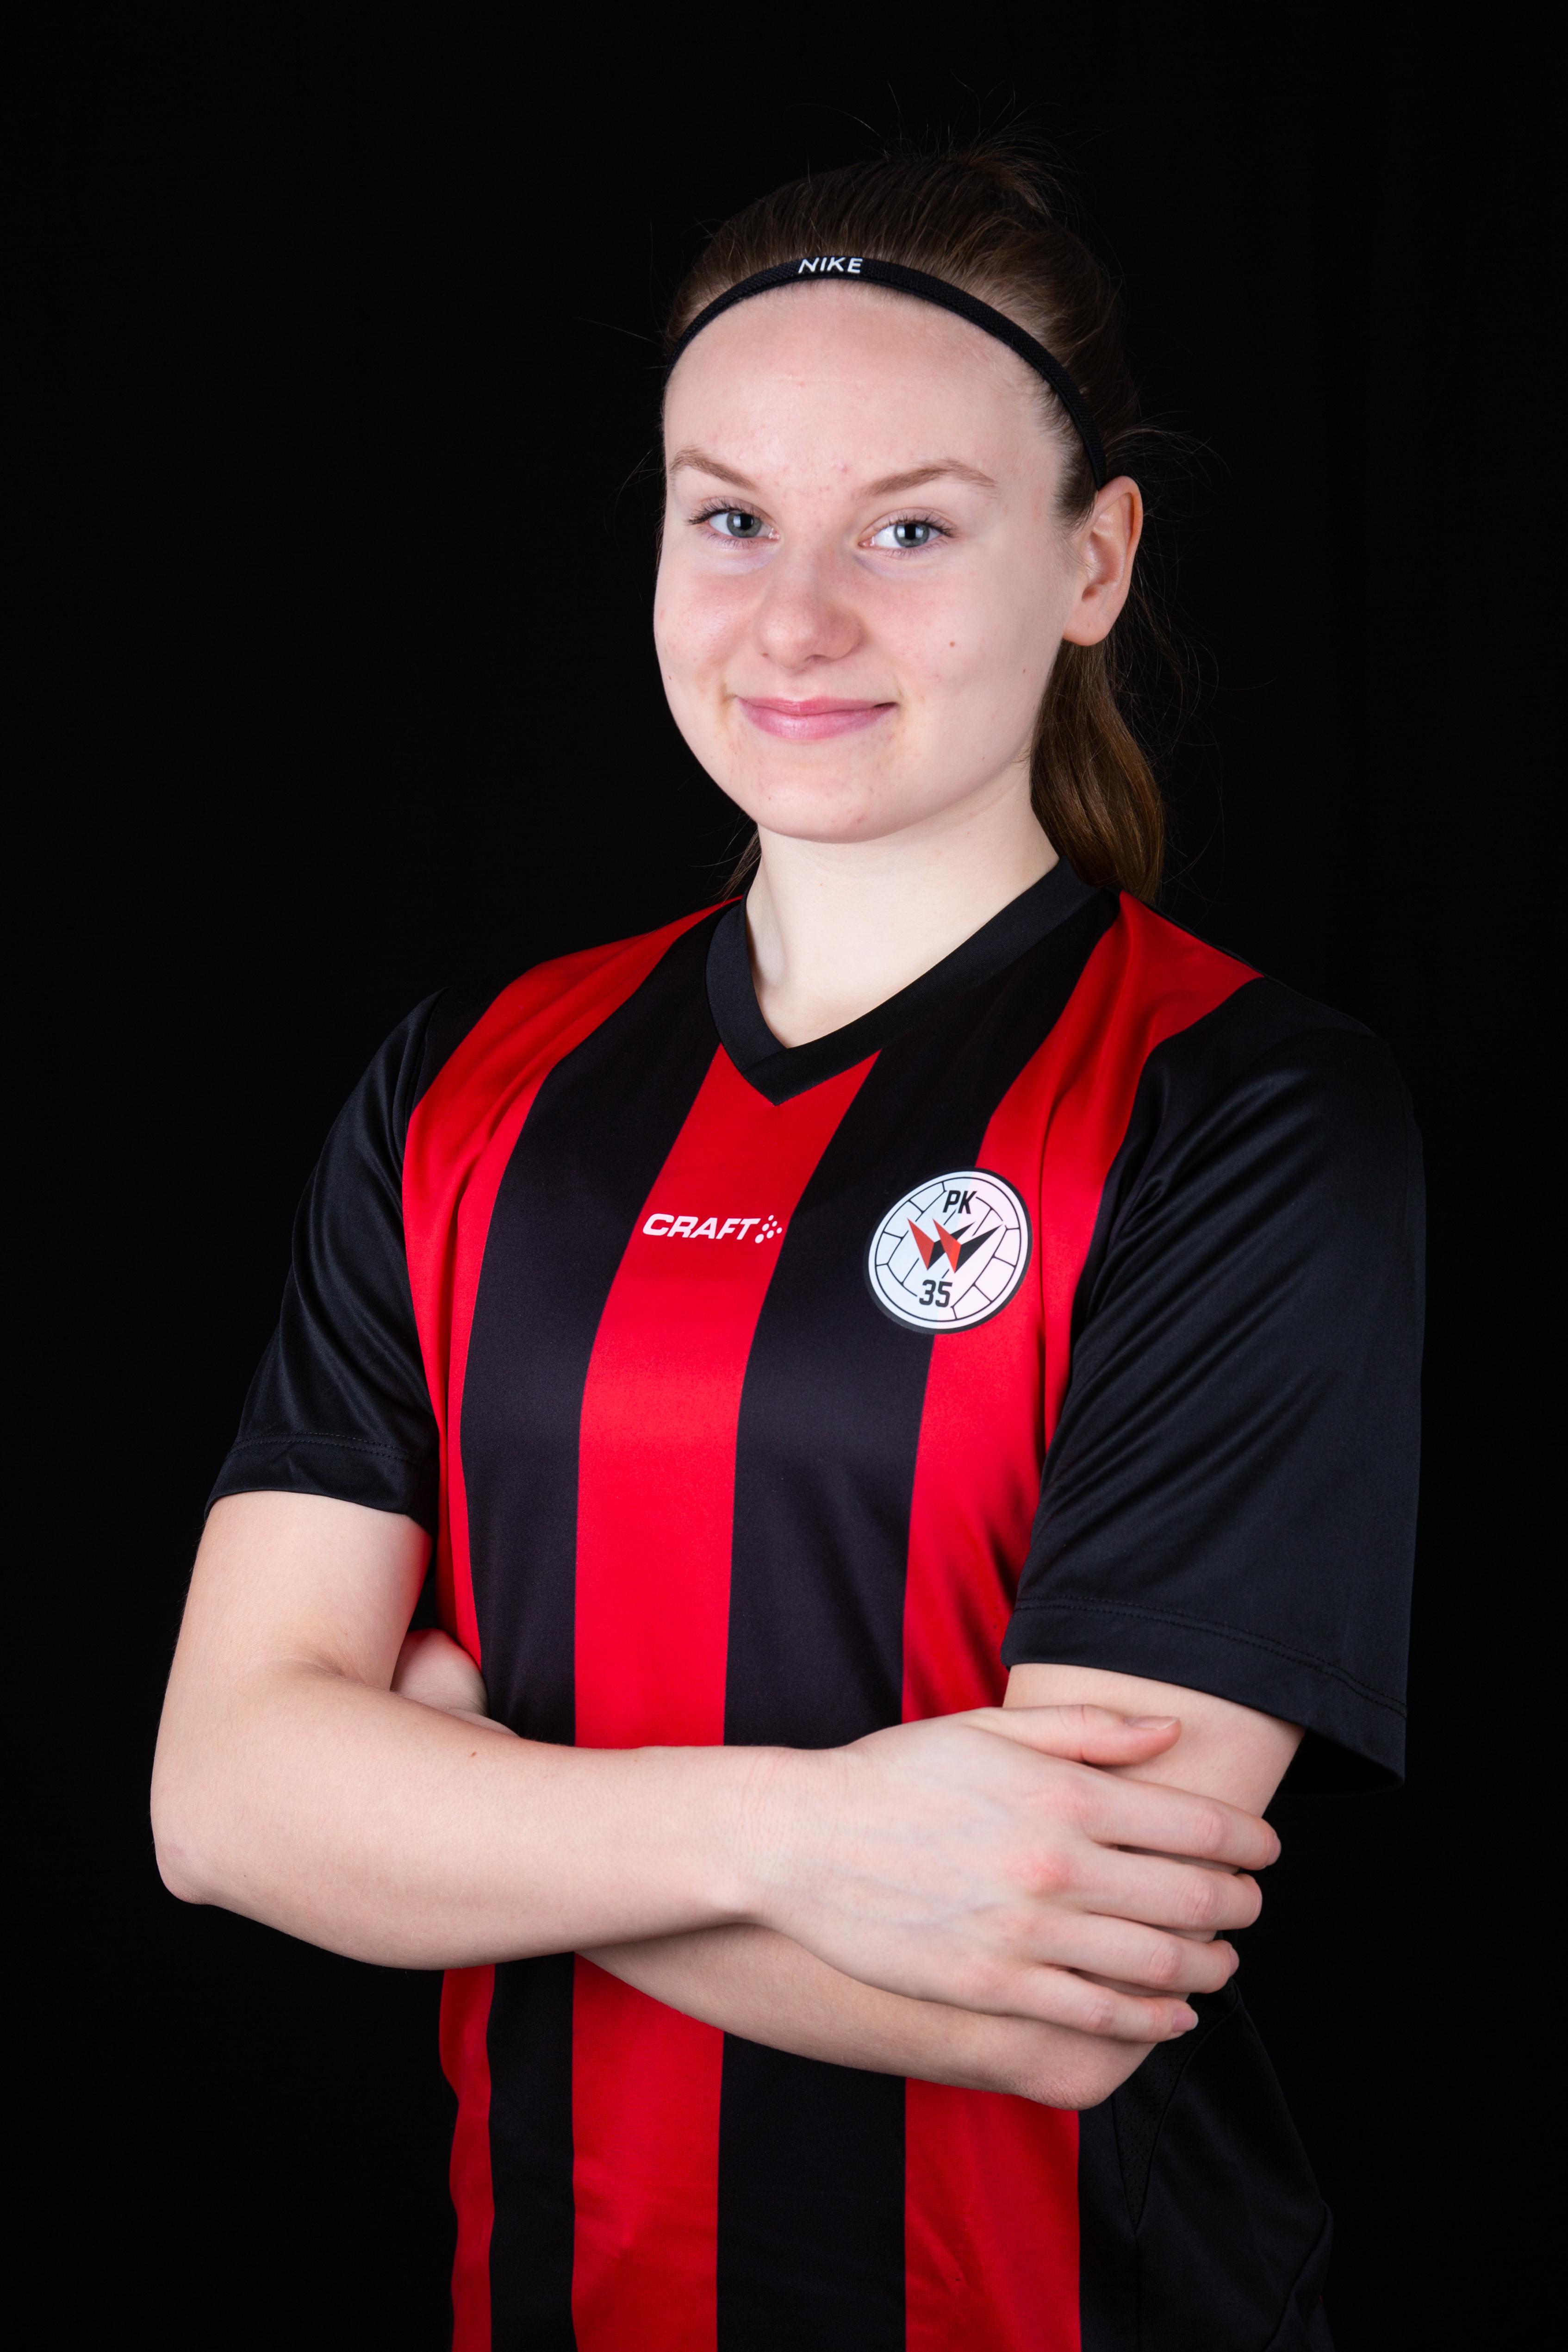 #2 Emma Korkalainen